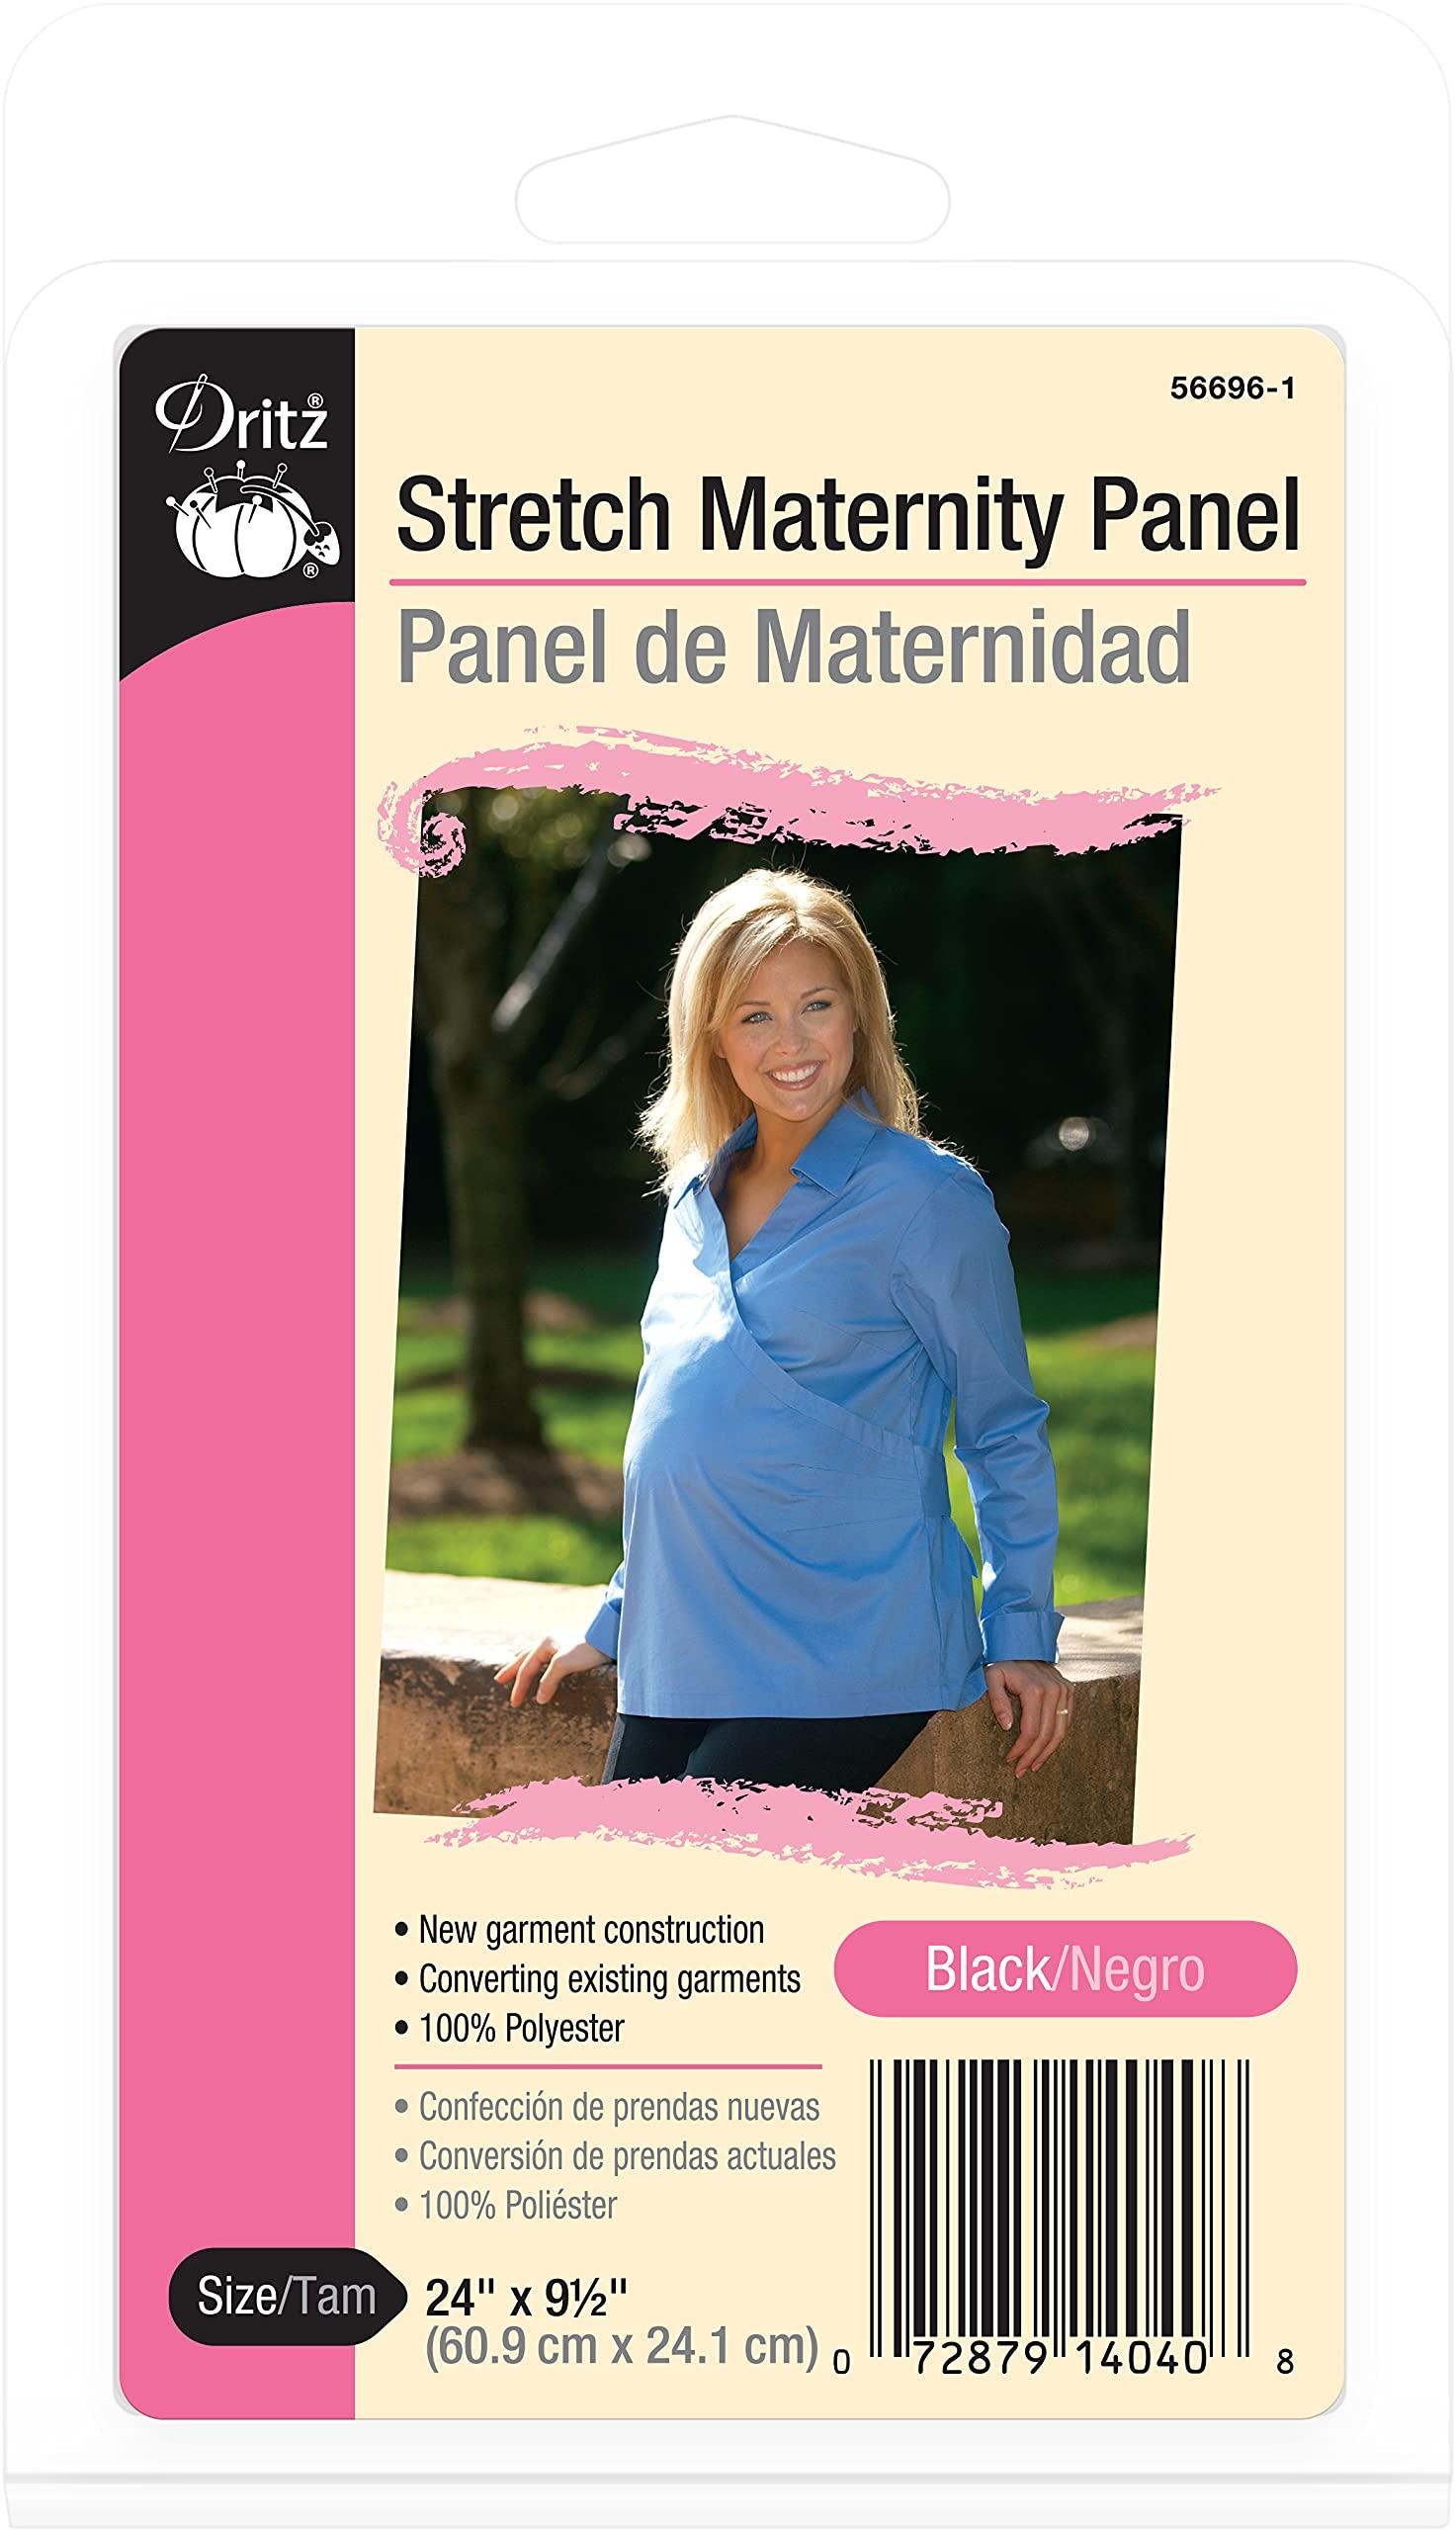 Dritz Stretch Maternity Panel, Black